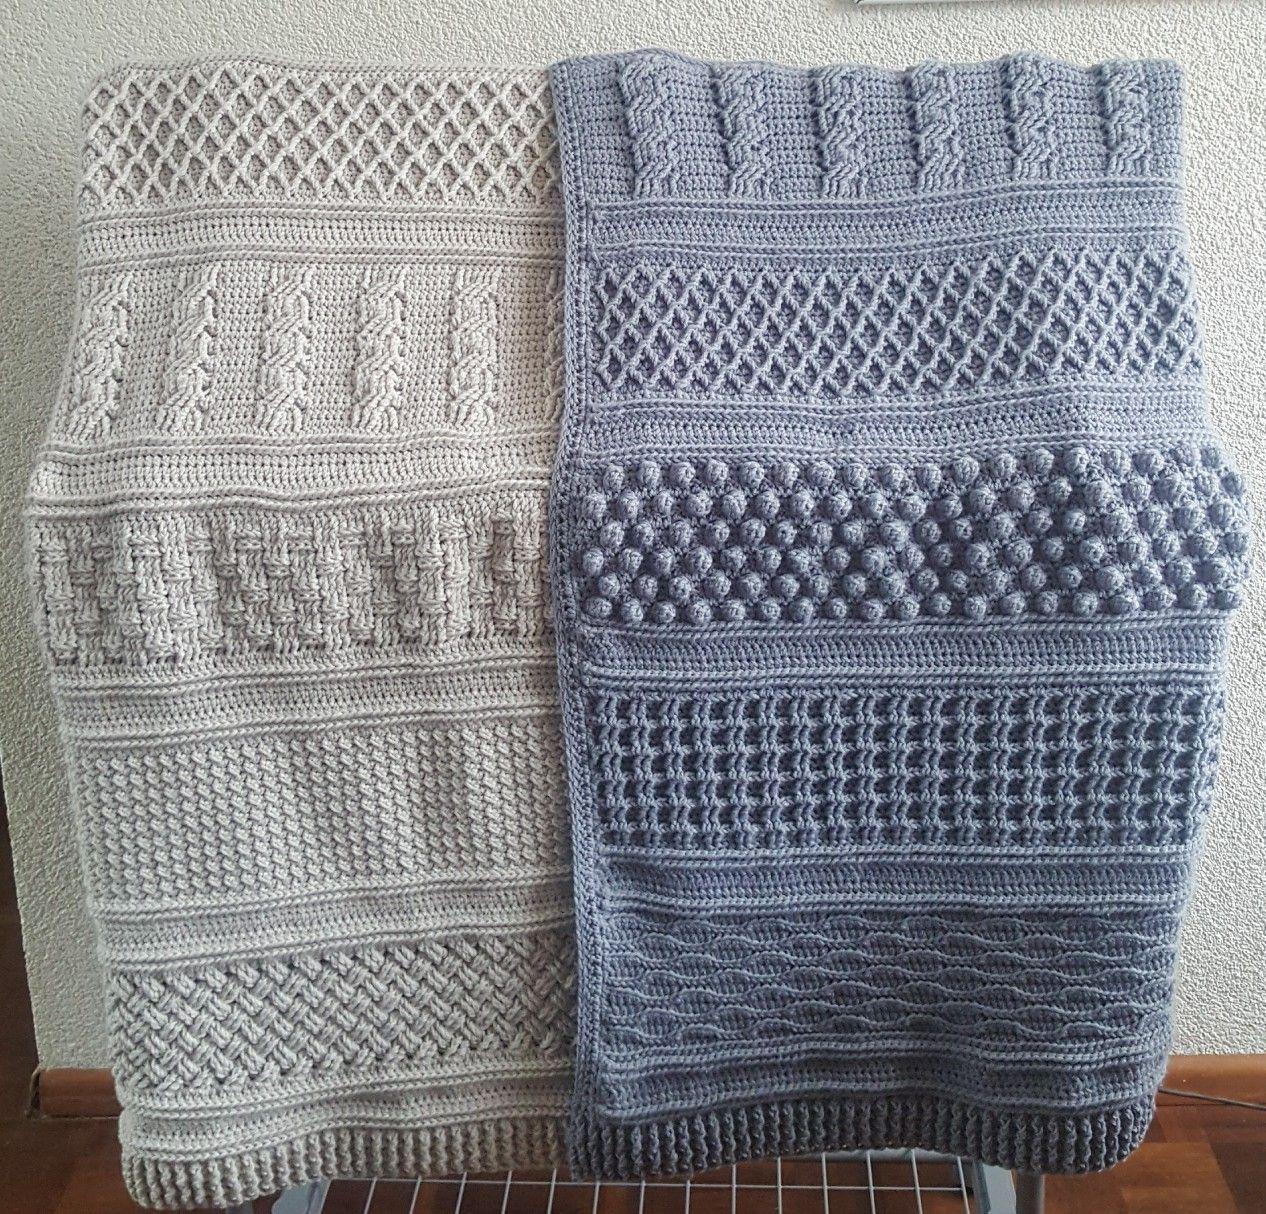 Droomdeken 20 Yarn Crafts Pinterest Crochet Knitting And